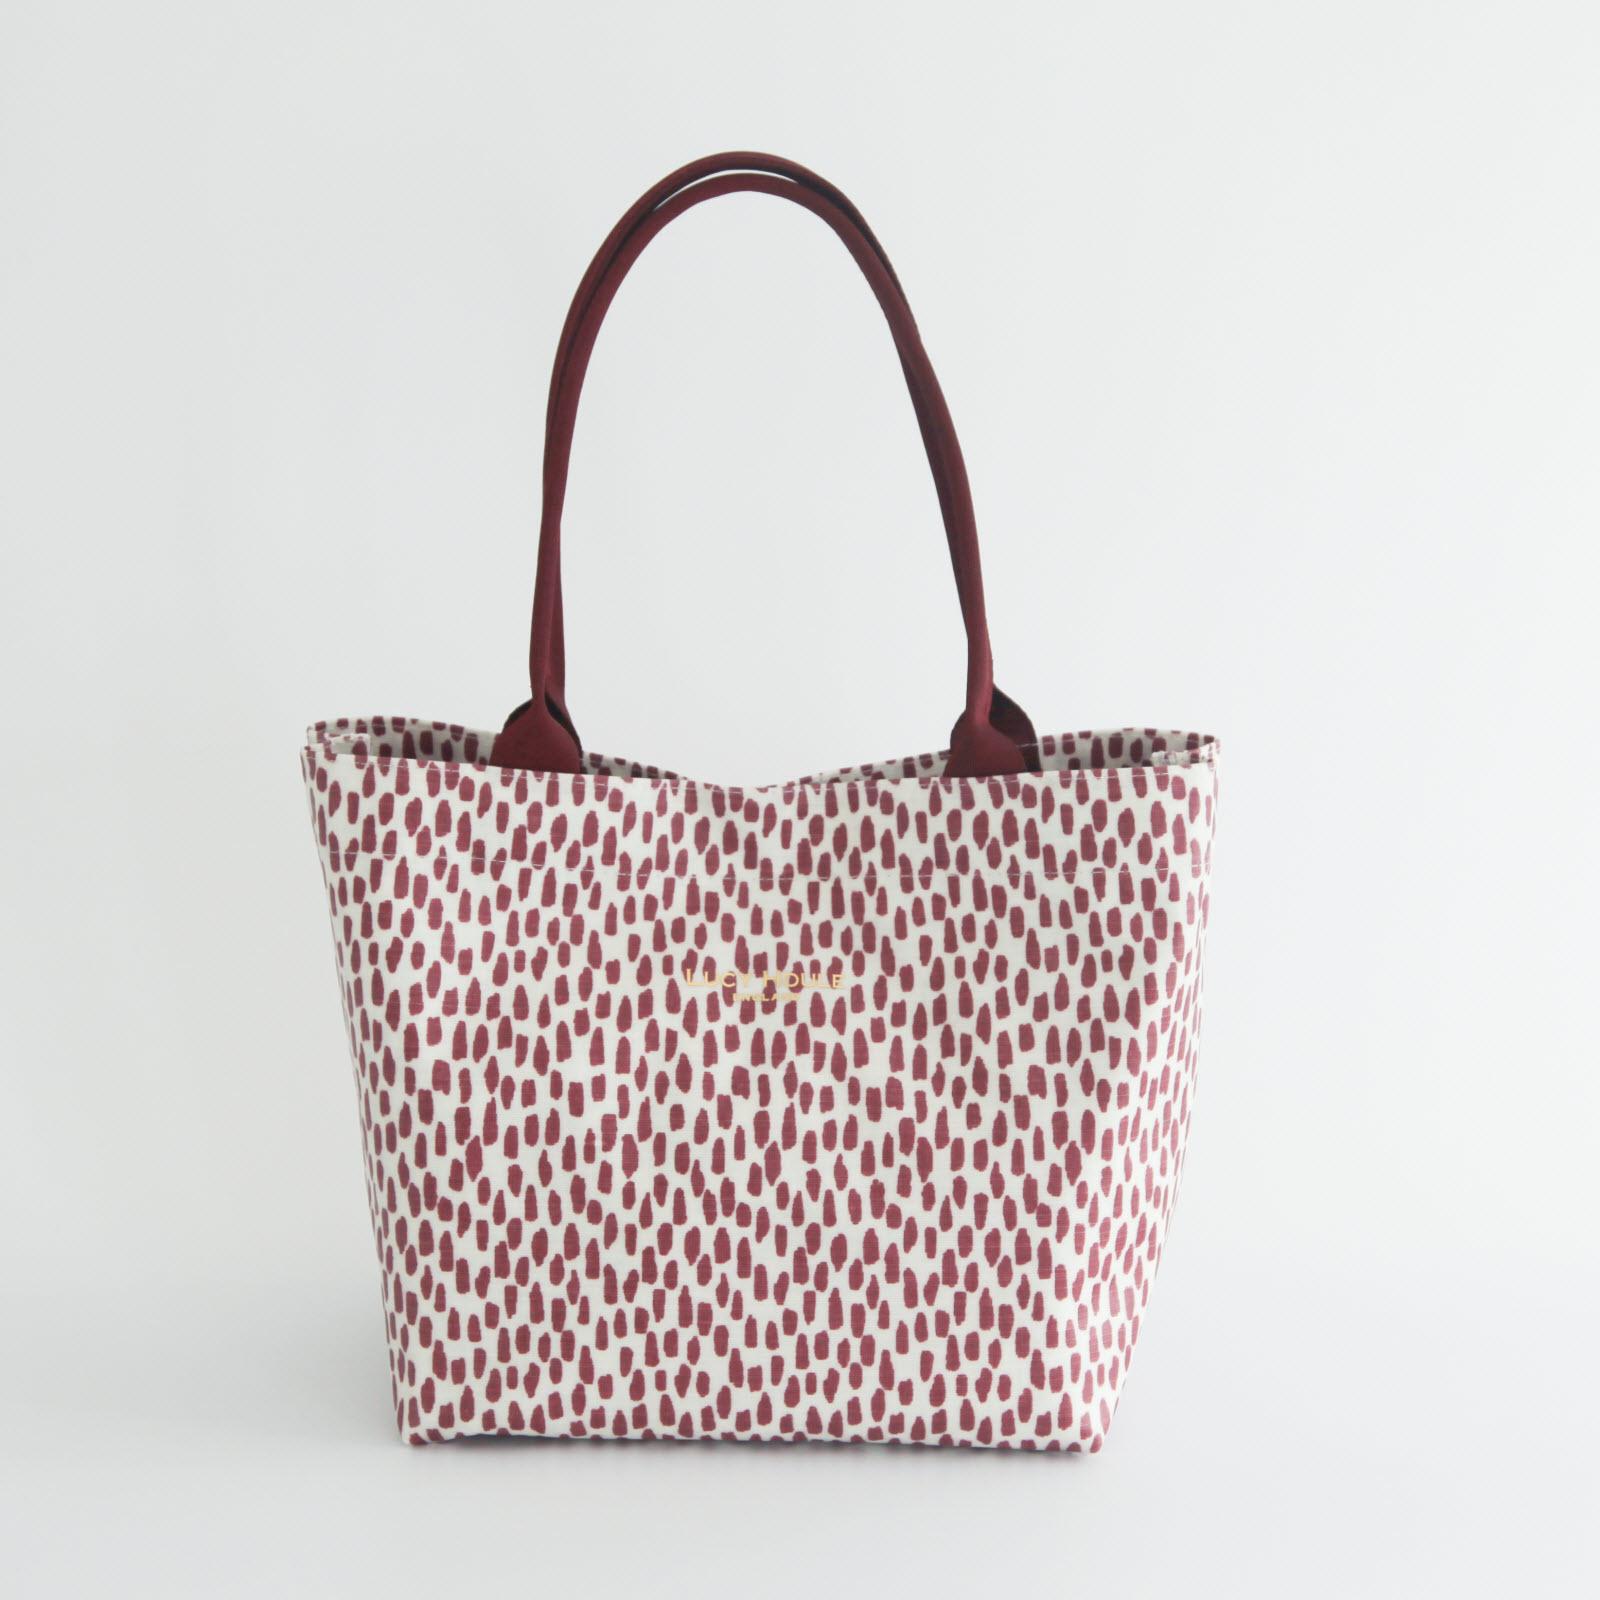 Mulberry Cobblestone Small Tote Bag 'Limited Edition'